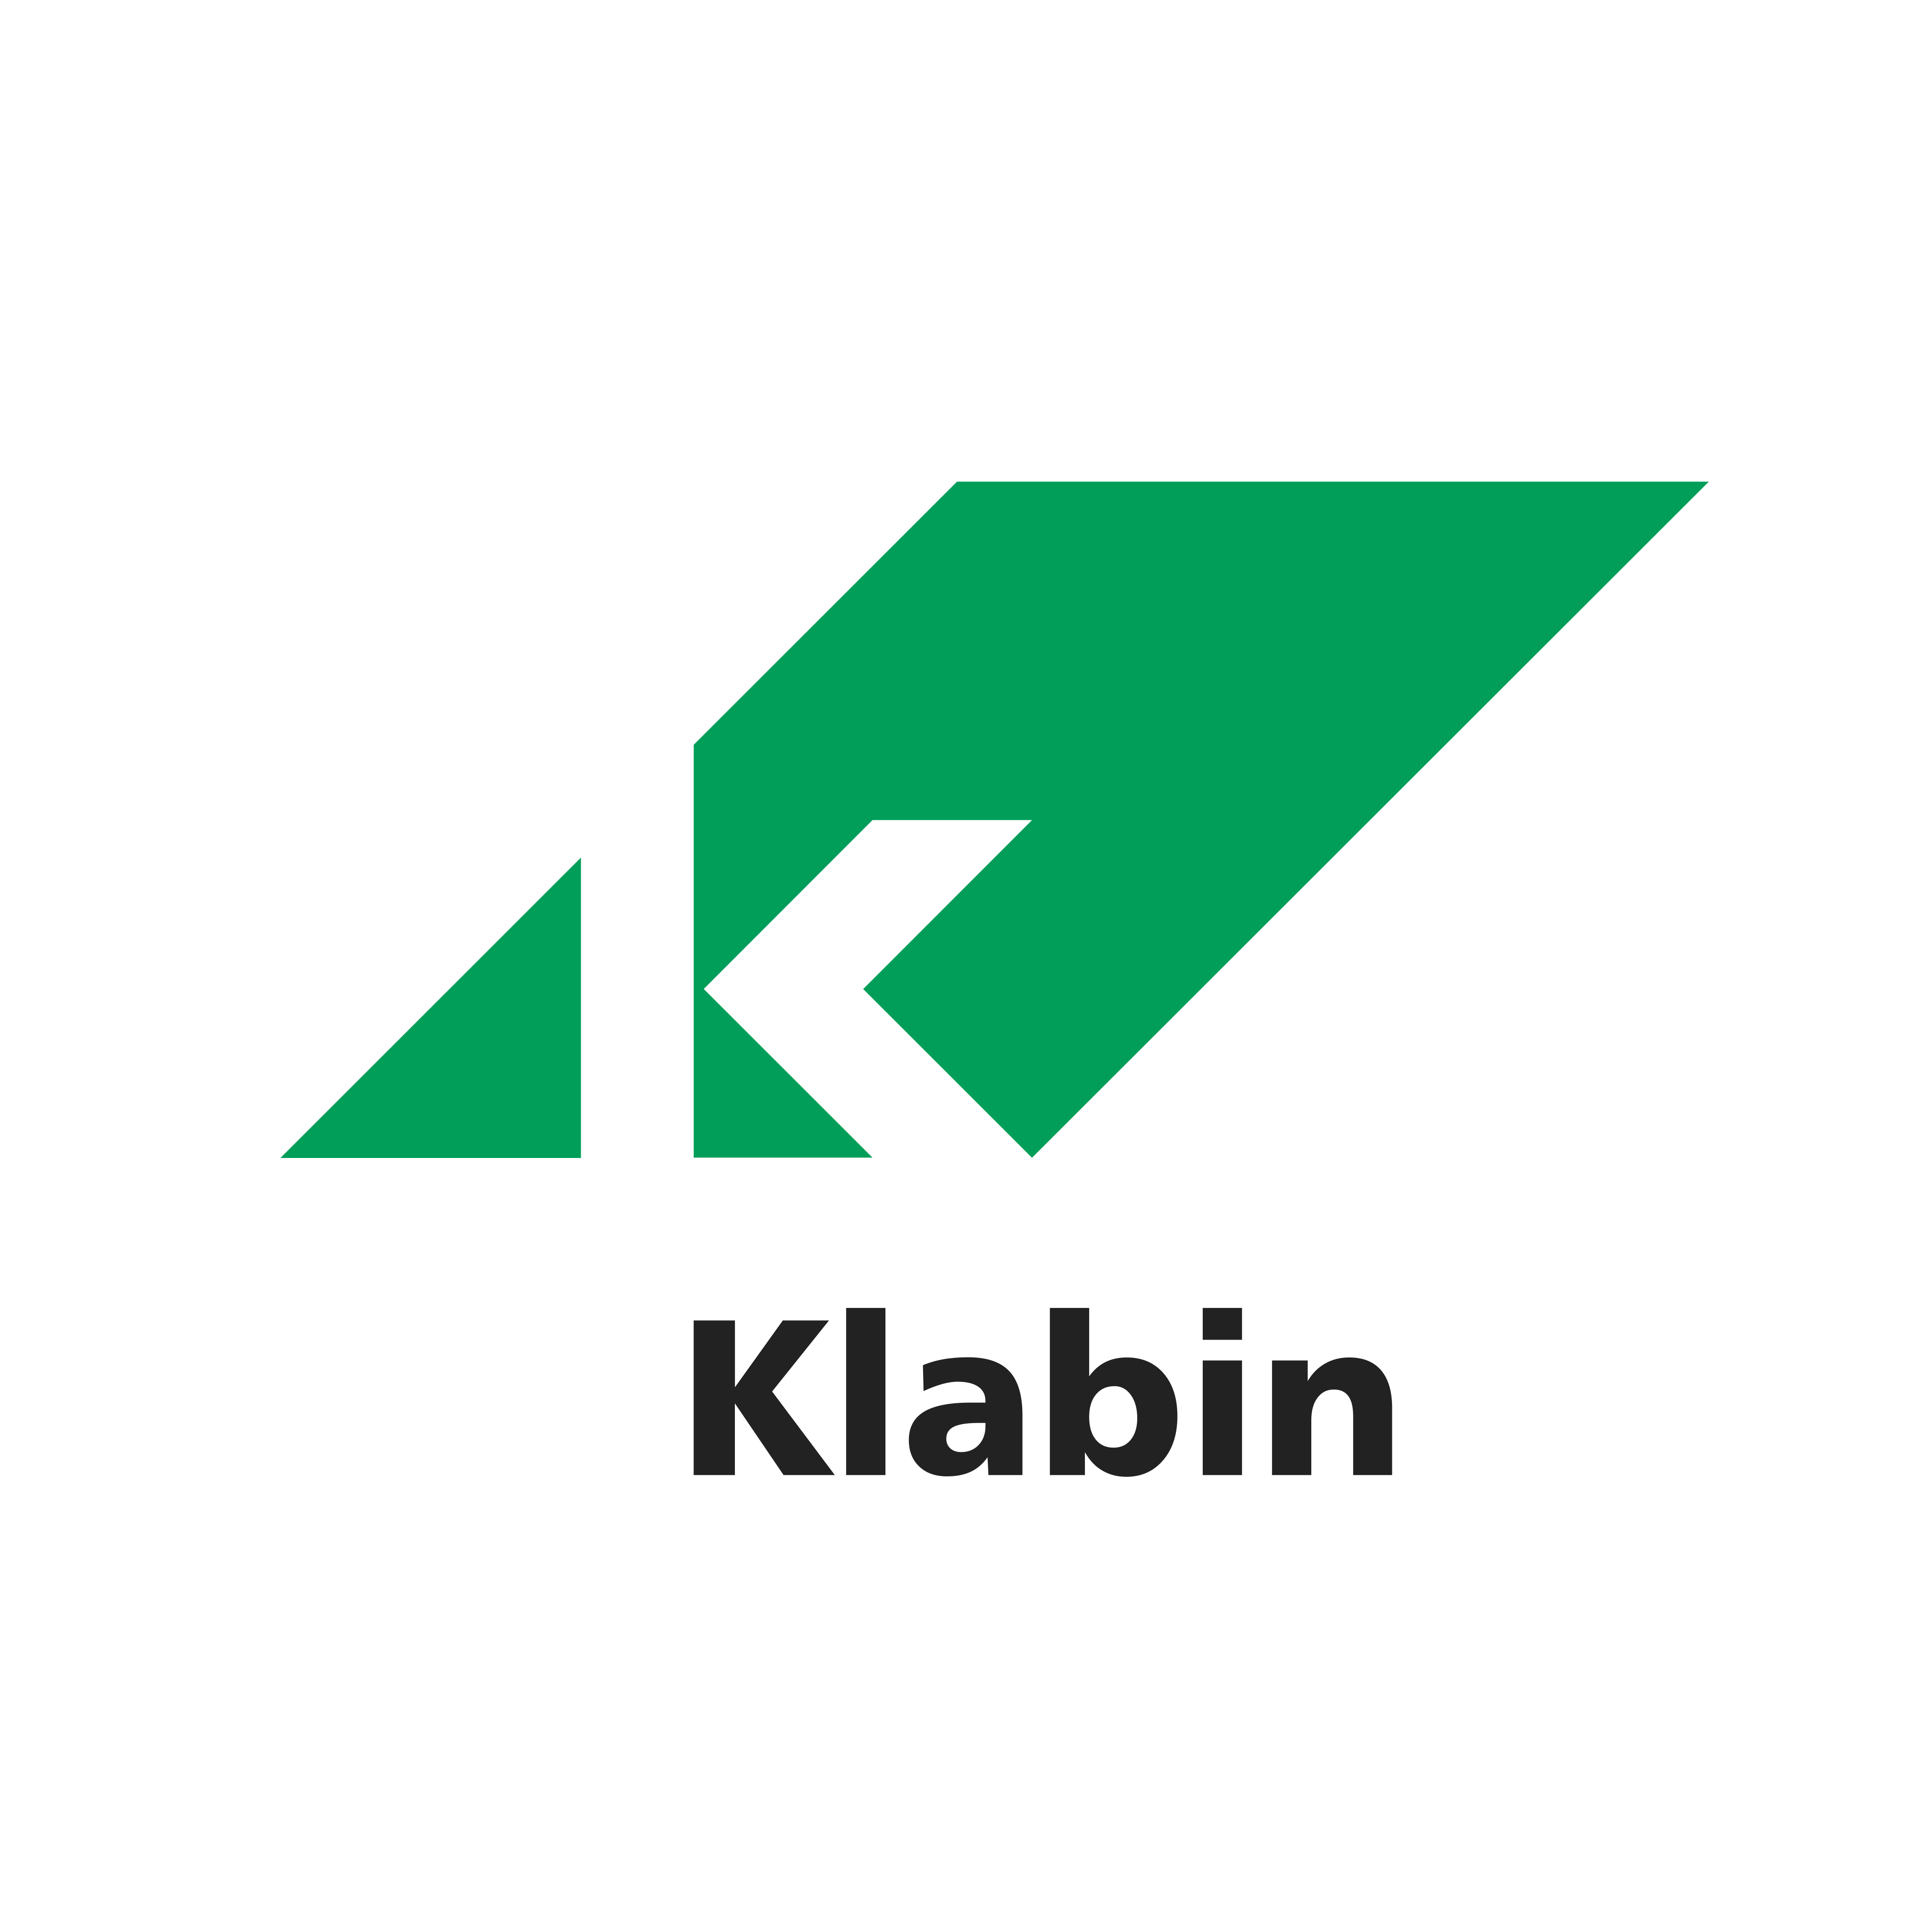 klabin logo 0 - Klabin Logo